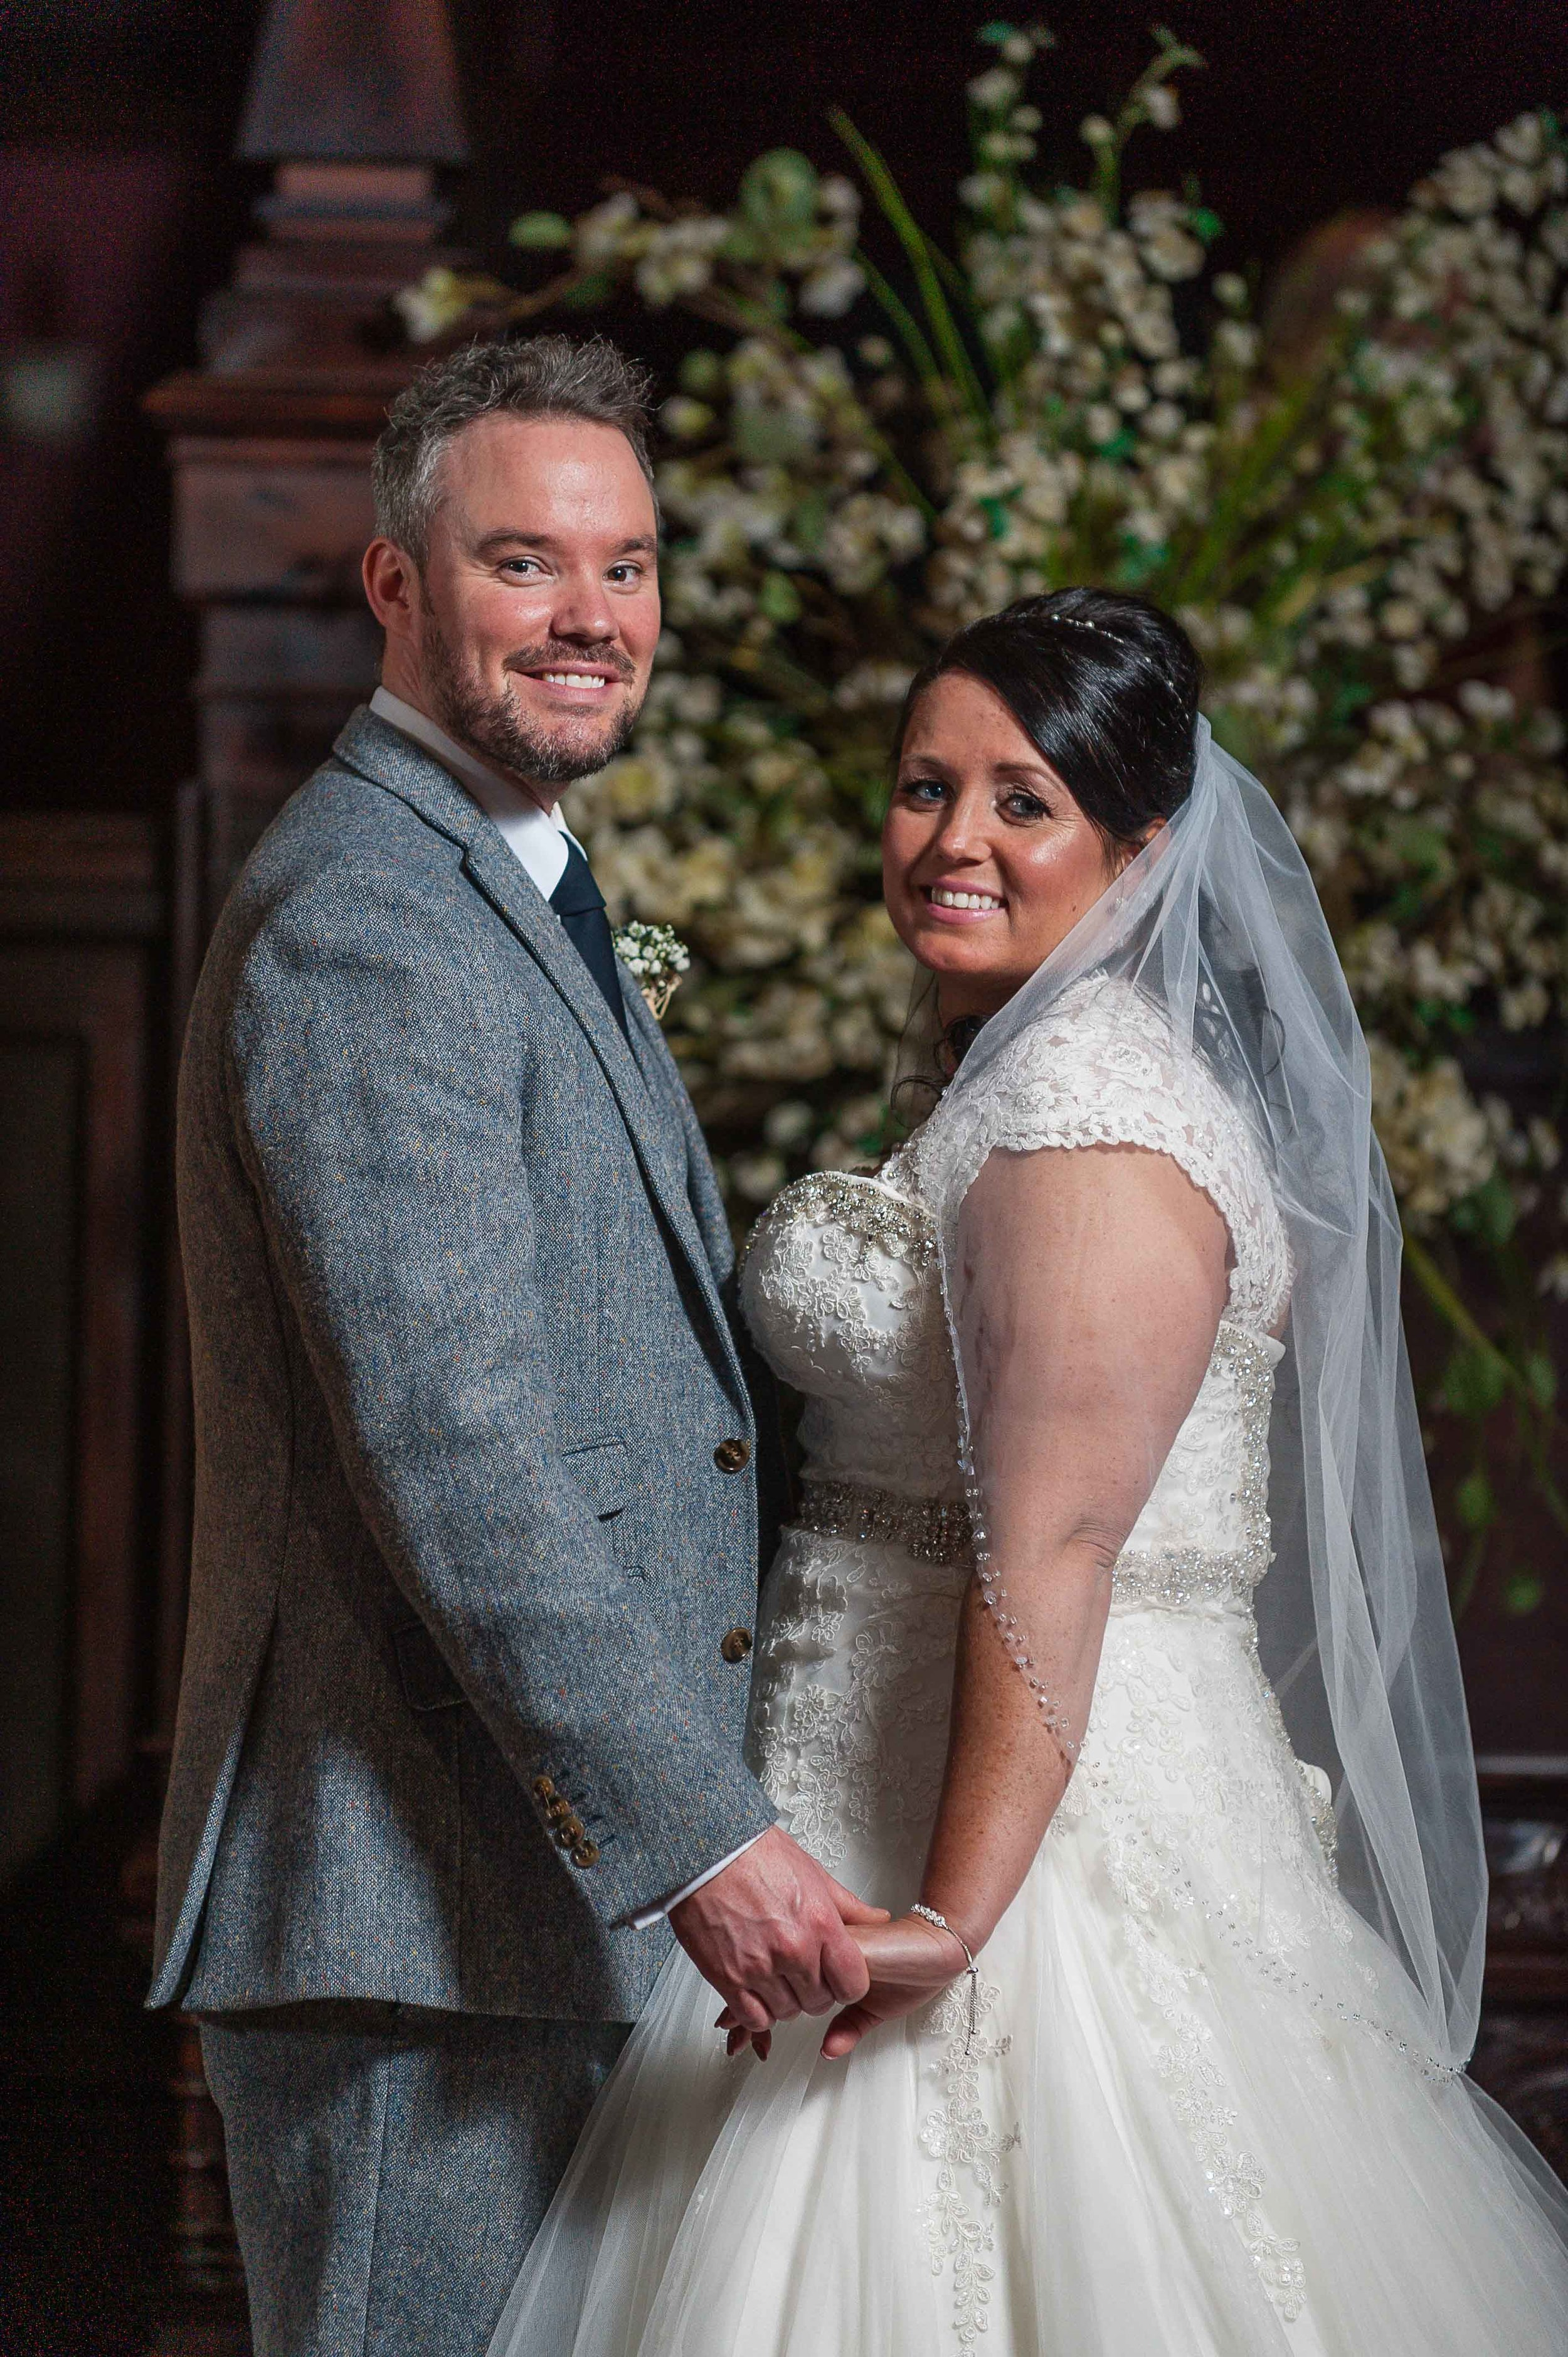 14.02.17 - Matt-Faye-Coombe-Abbey-Valentine-Wedding-Charnwood-Photography-1089.jpg